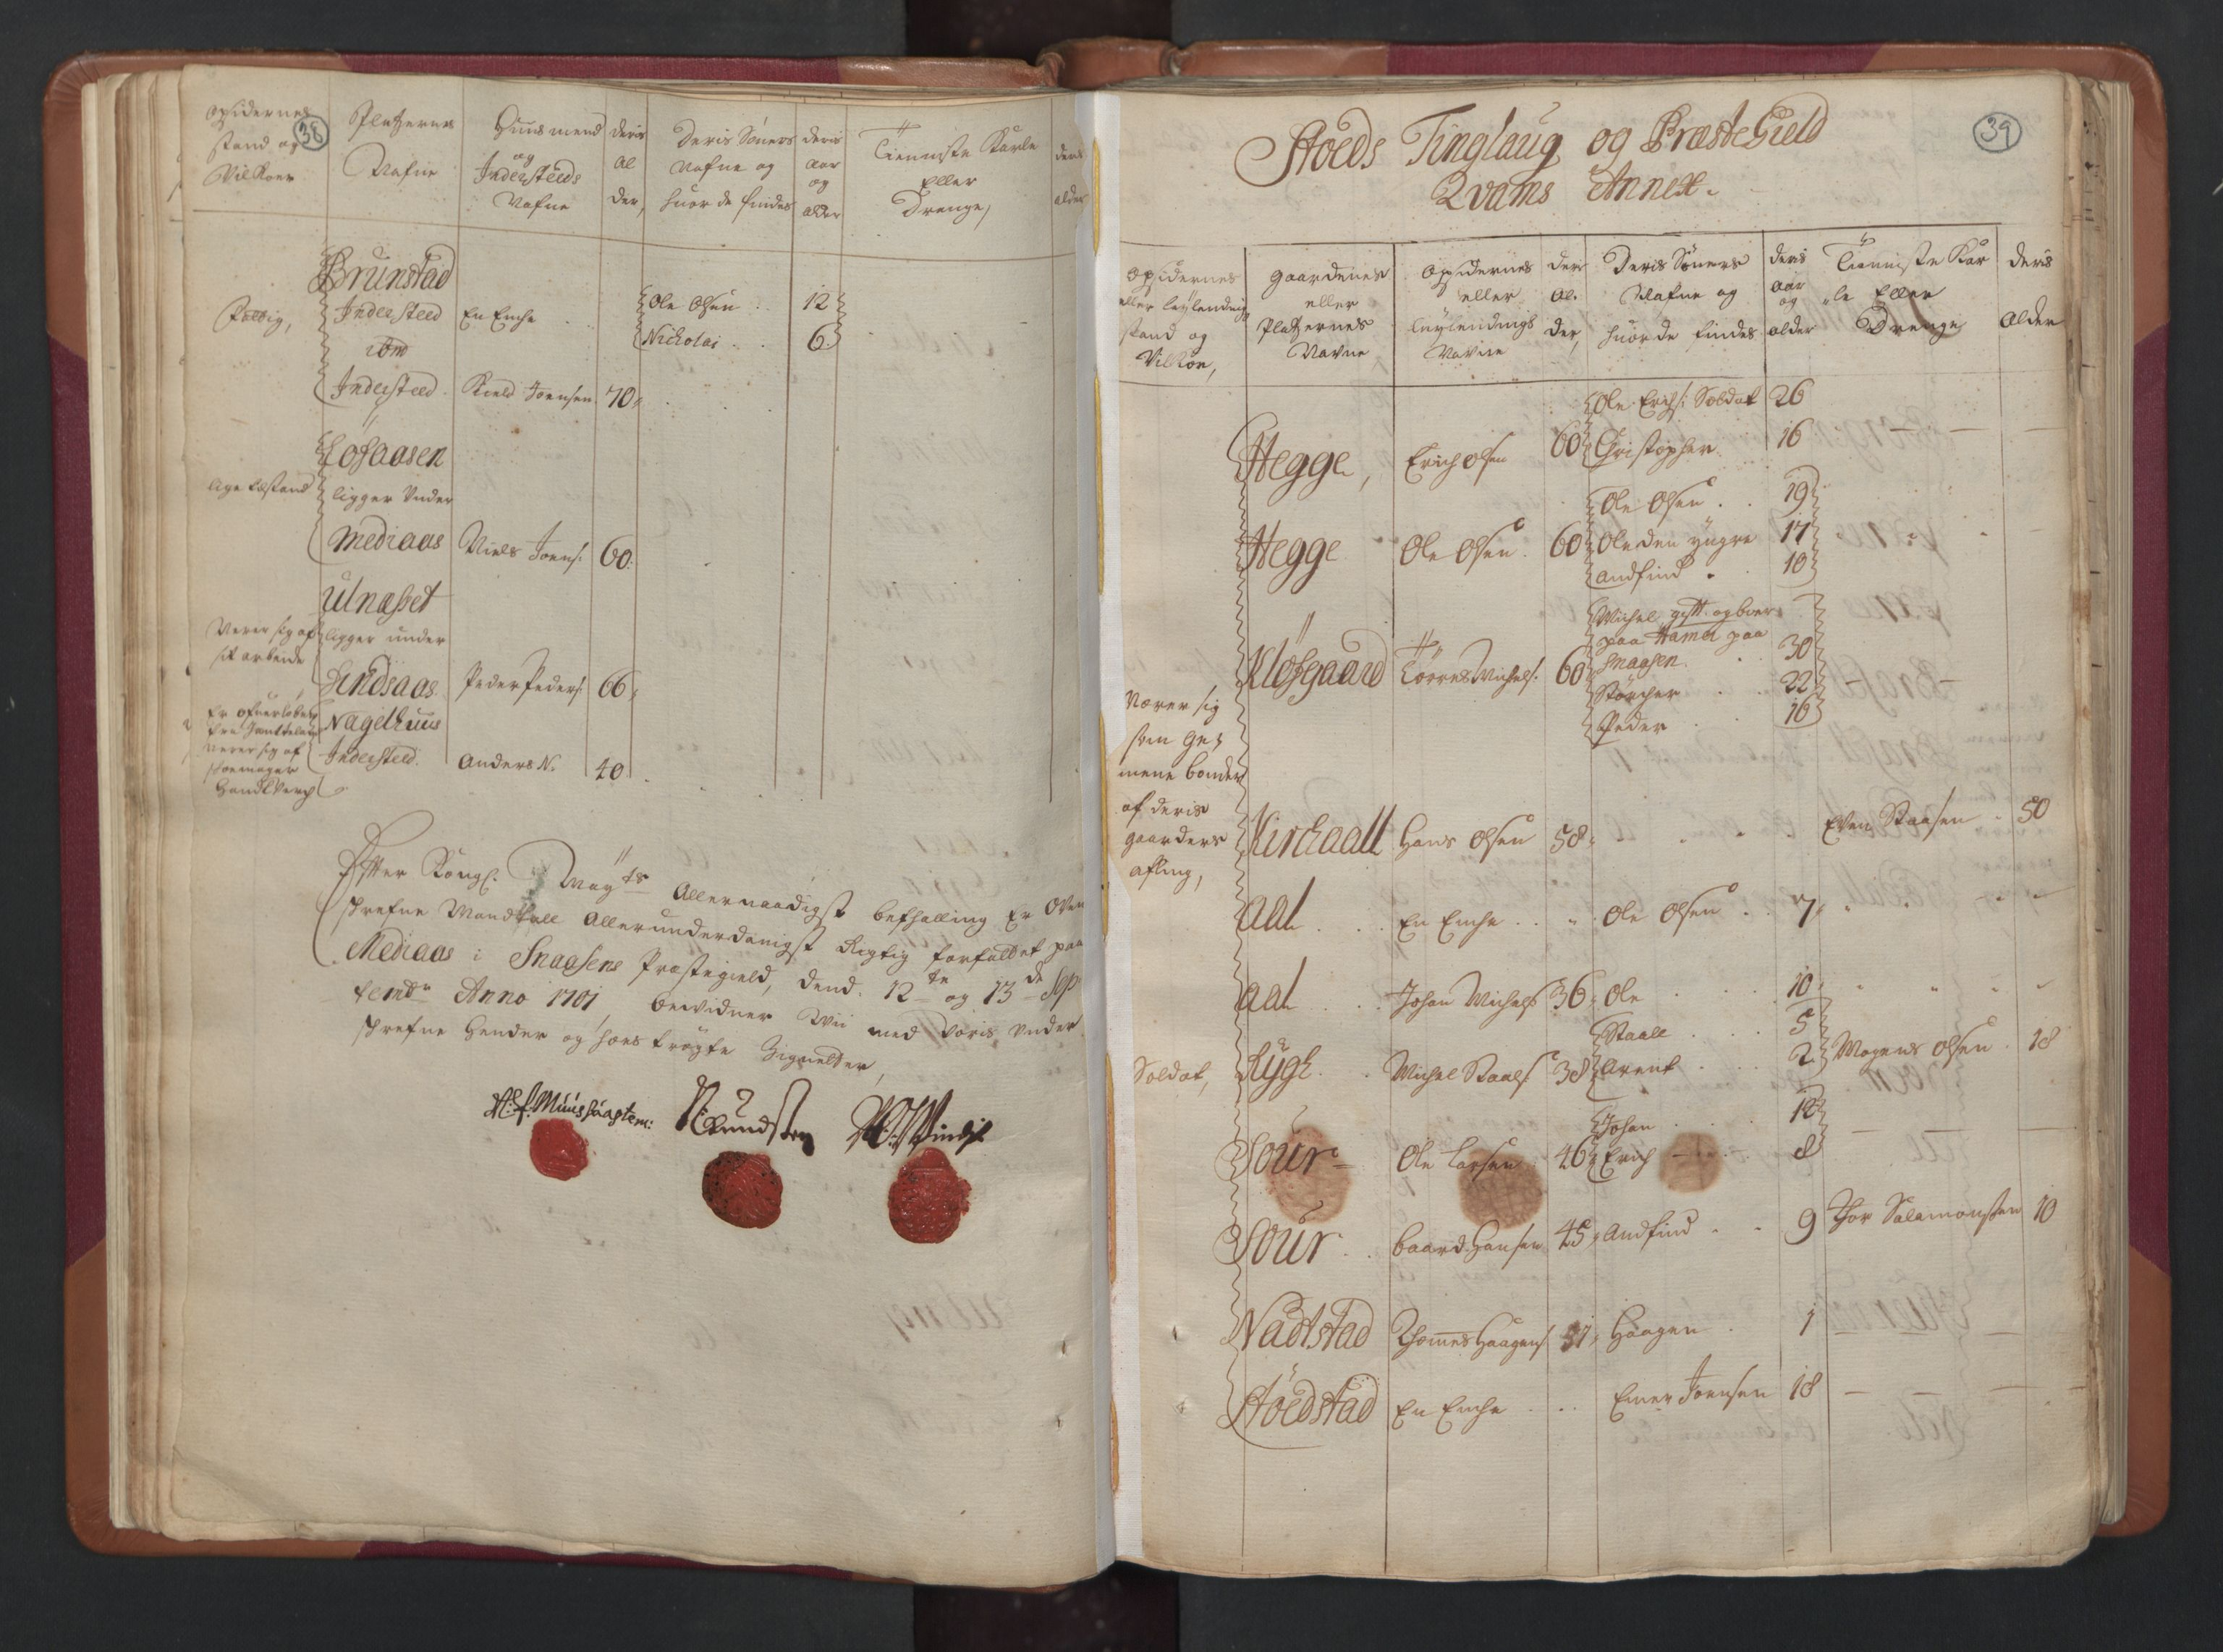 RA, Manntallet 1701, nr. 15: Inderøy fogderi og Namdal fogderi, 1701, s. 38-39